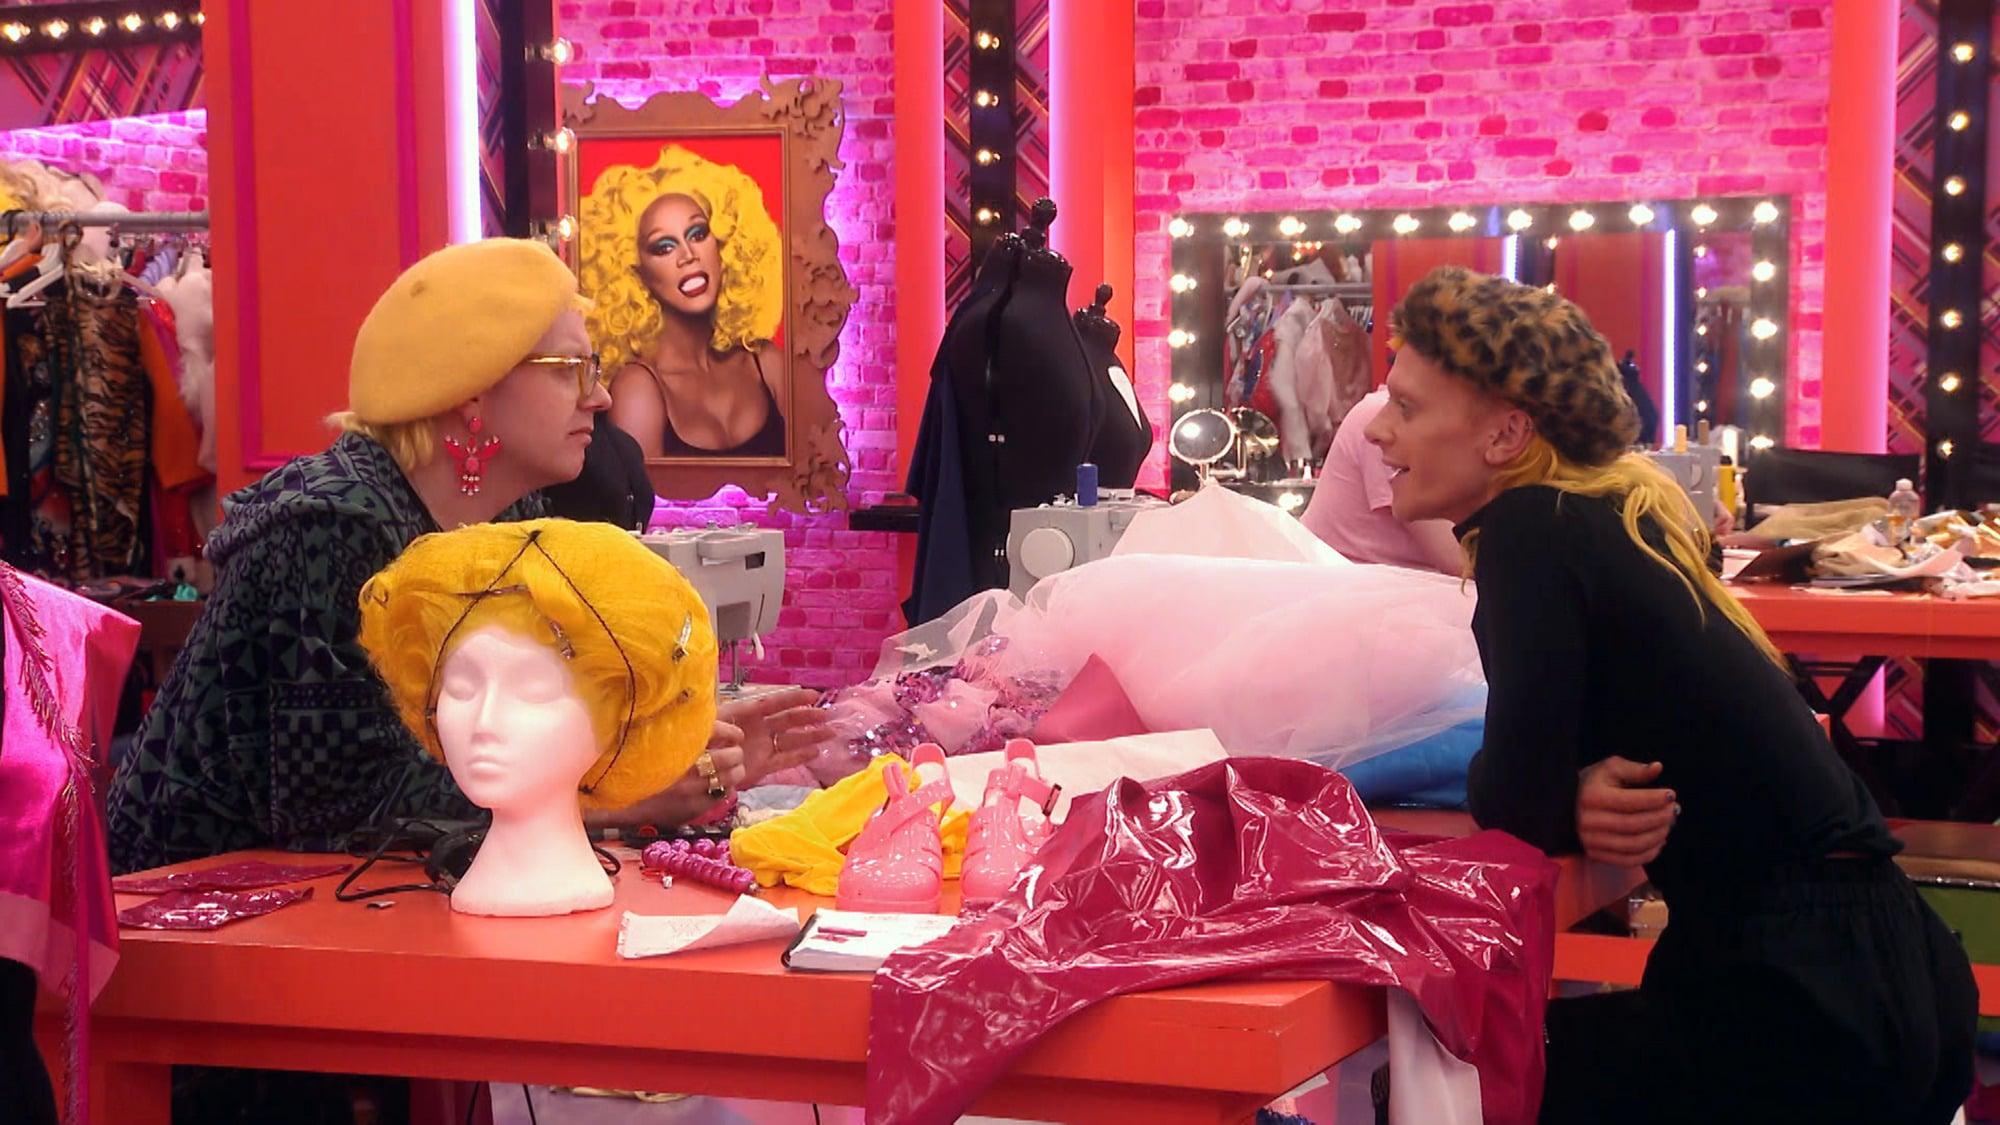 نام برنامه: RuPaul's Drag Race UK سریال 2 - TX: n / a - قسمت: RuPaul's Drag Race series UK 2 قسمت 3 (شماره 3) - نمایش های عکس: جینی لیمون ، Bimini Bon Boulash - (C) World of Wonder - عکاس : گای لوی